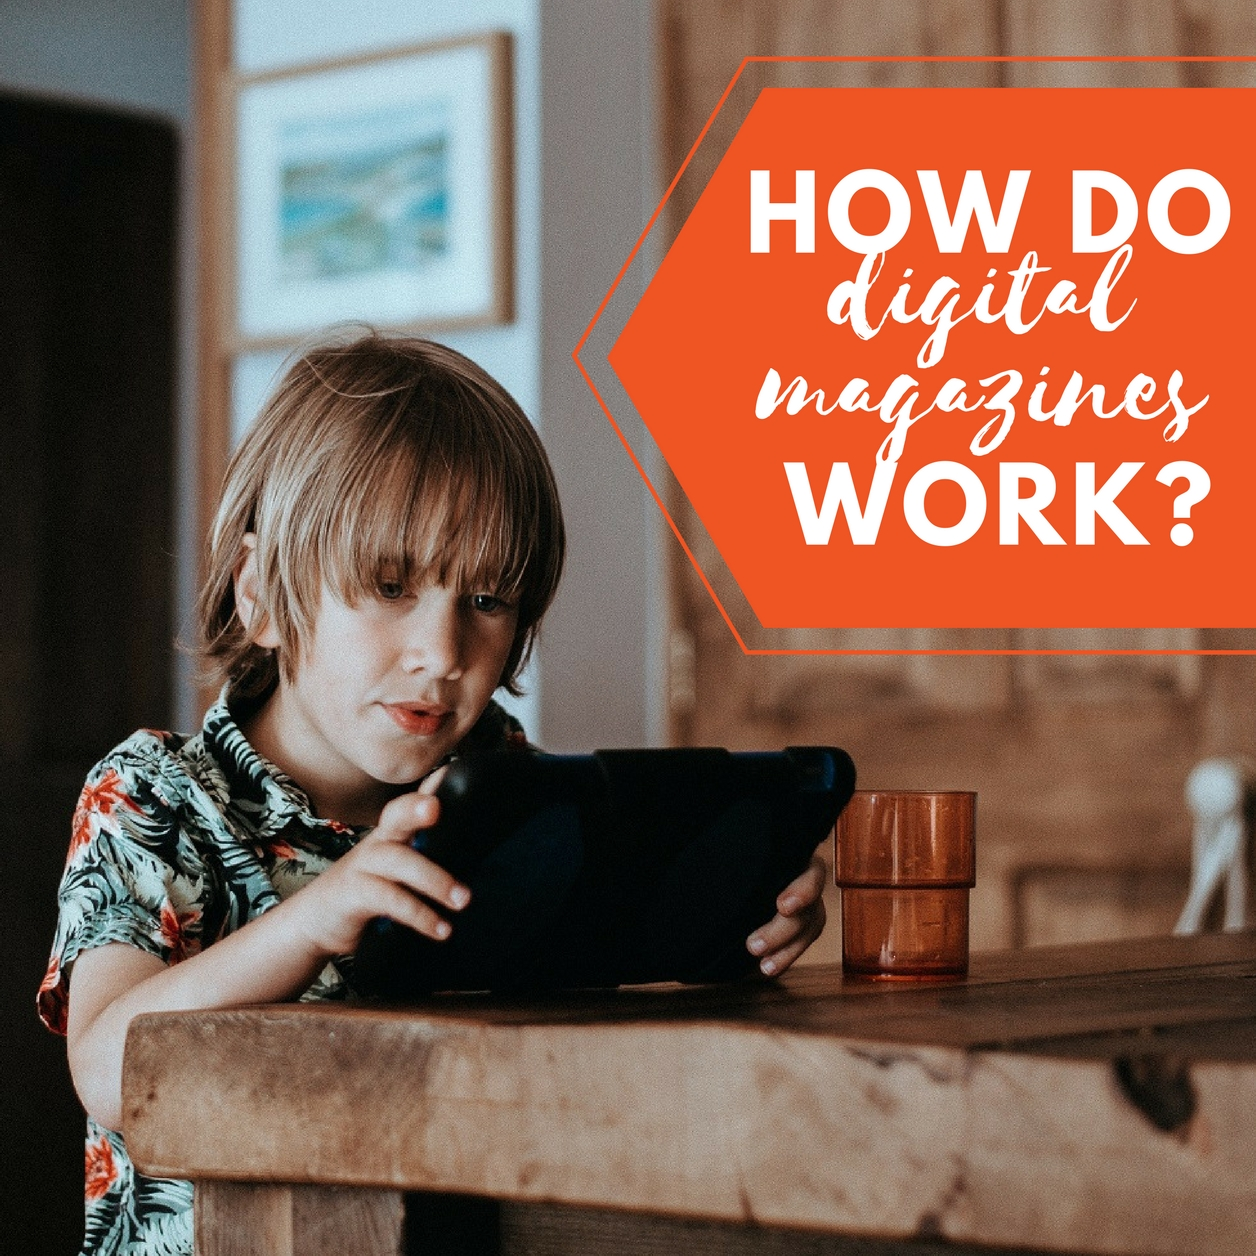 How do digital magazines work?